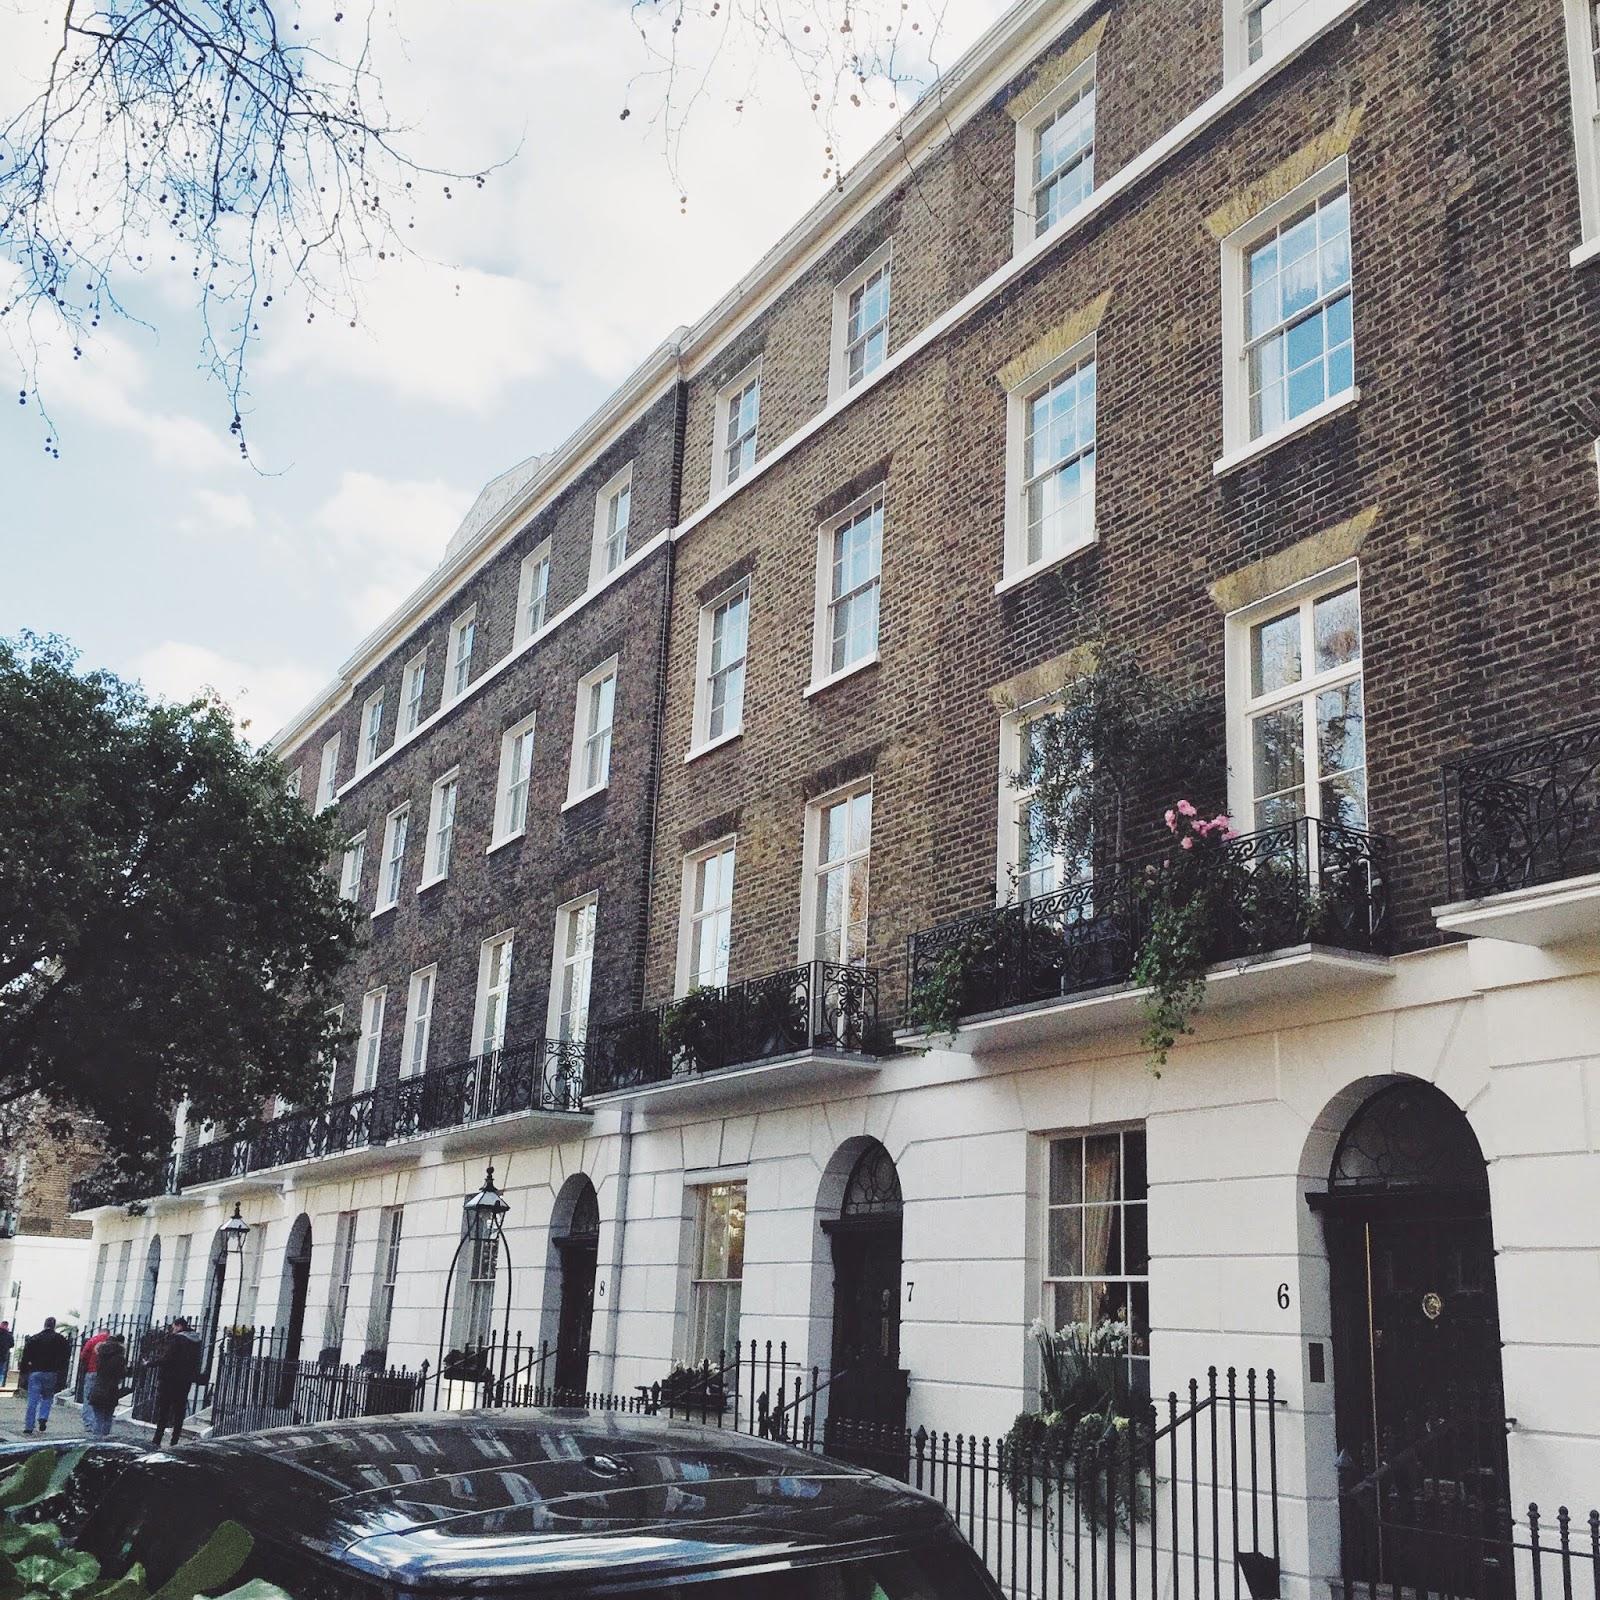 halcyonvelvet, fbloggers, zsllondonzoo, londonzoo, camden, travel, londonzooreview, theterracewimbledon, alfornowimbledon, london, aweekendinlondon, pancakes, pastries, cocktails, southkensington